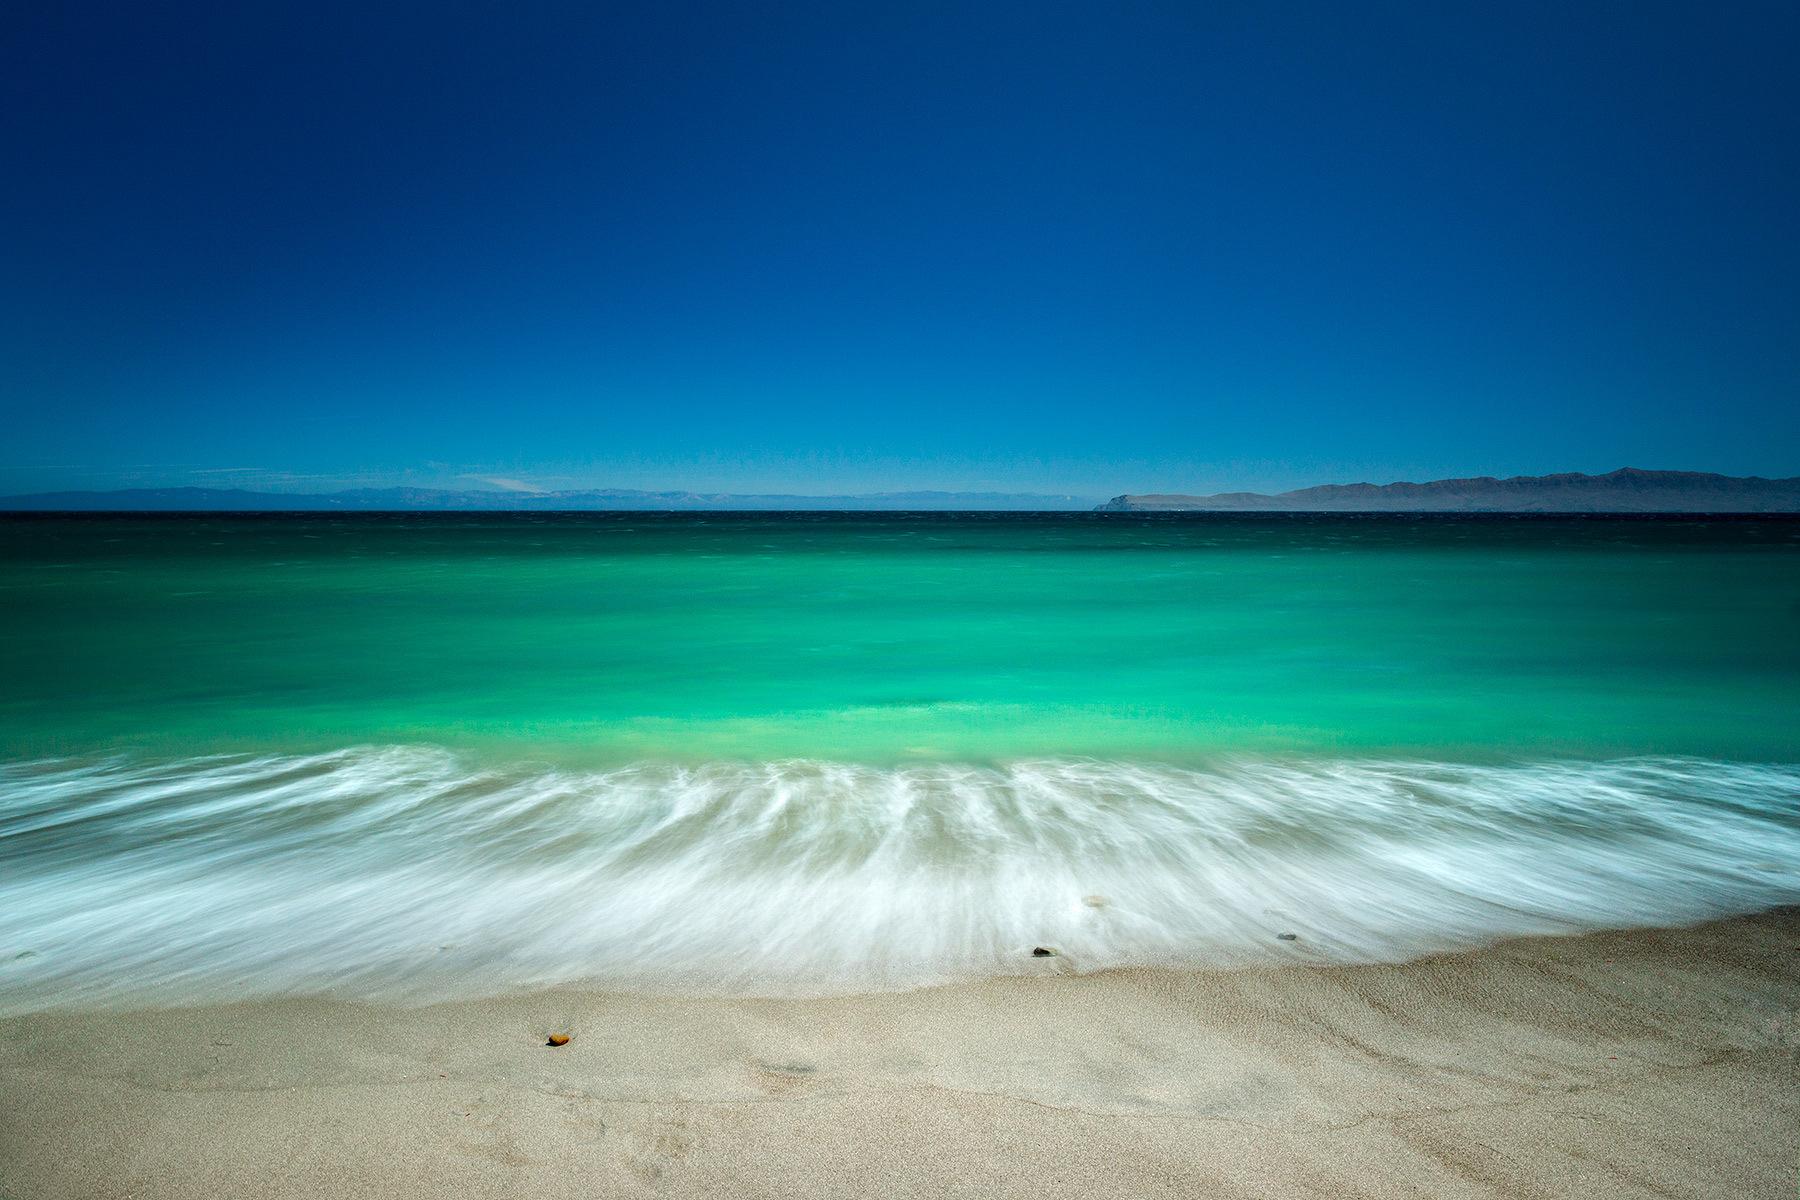 CHANNEL ISLANDS WATER STUDY #01